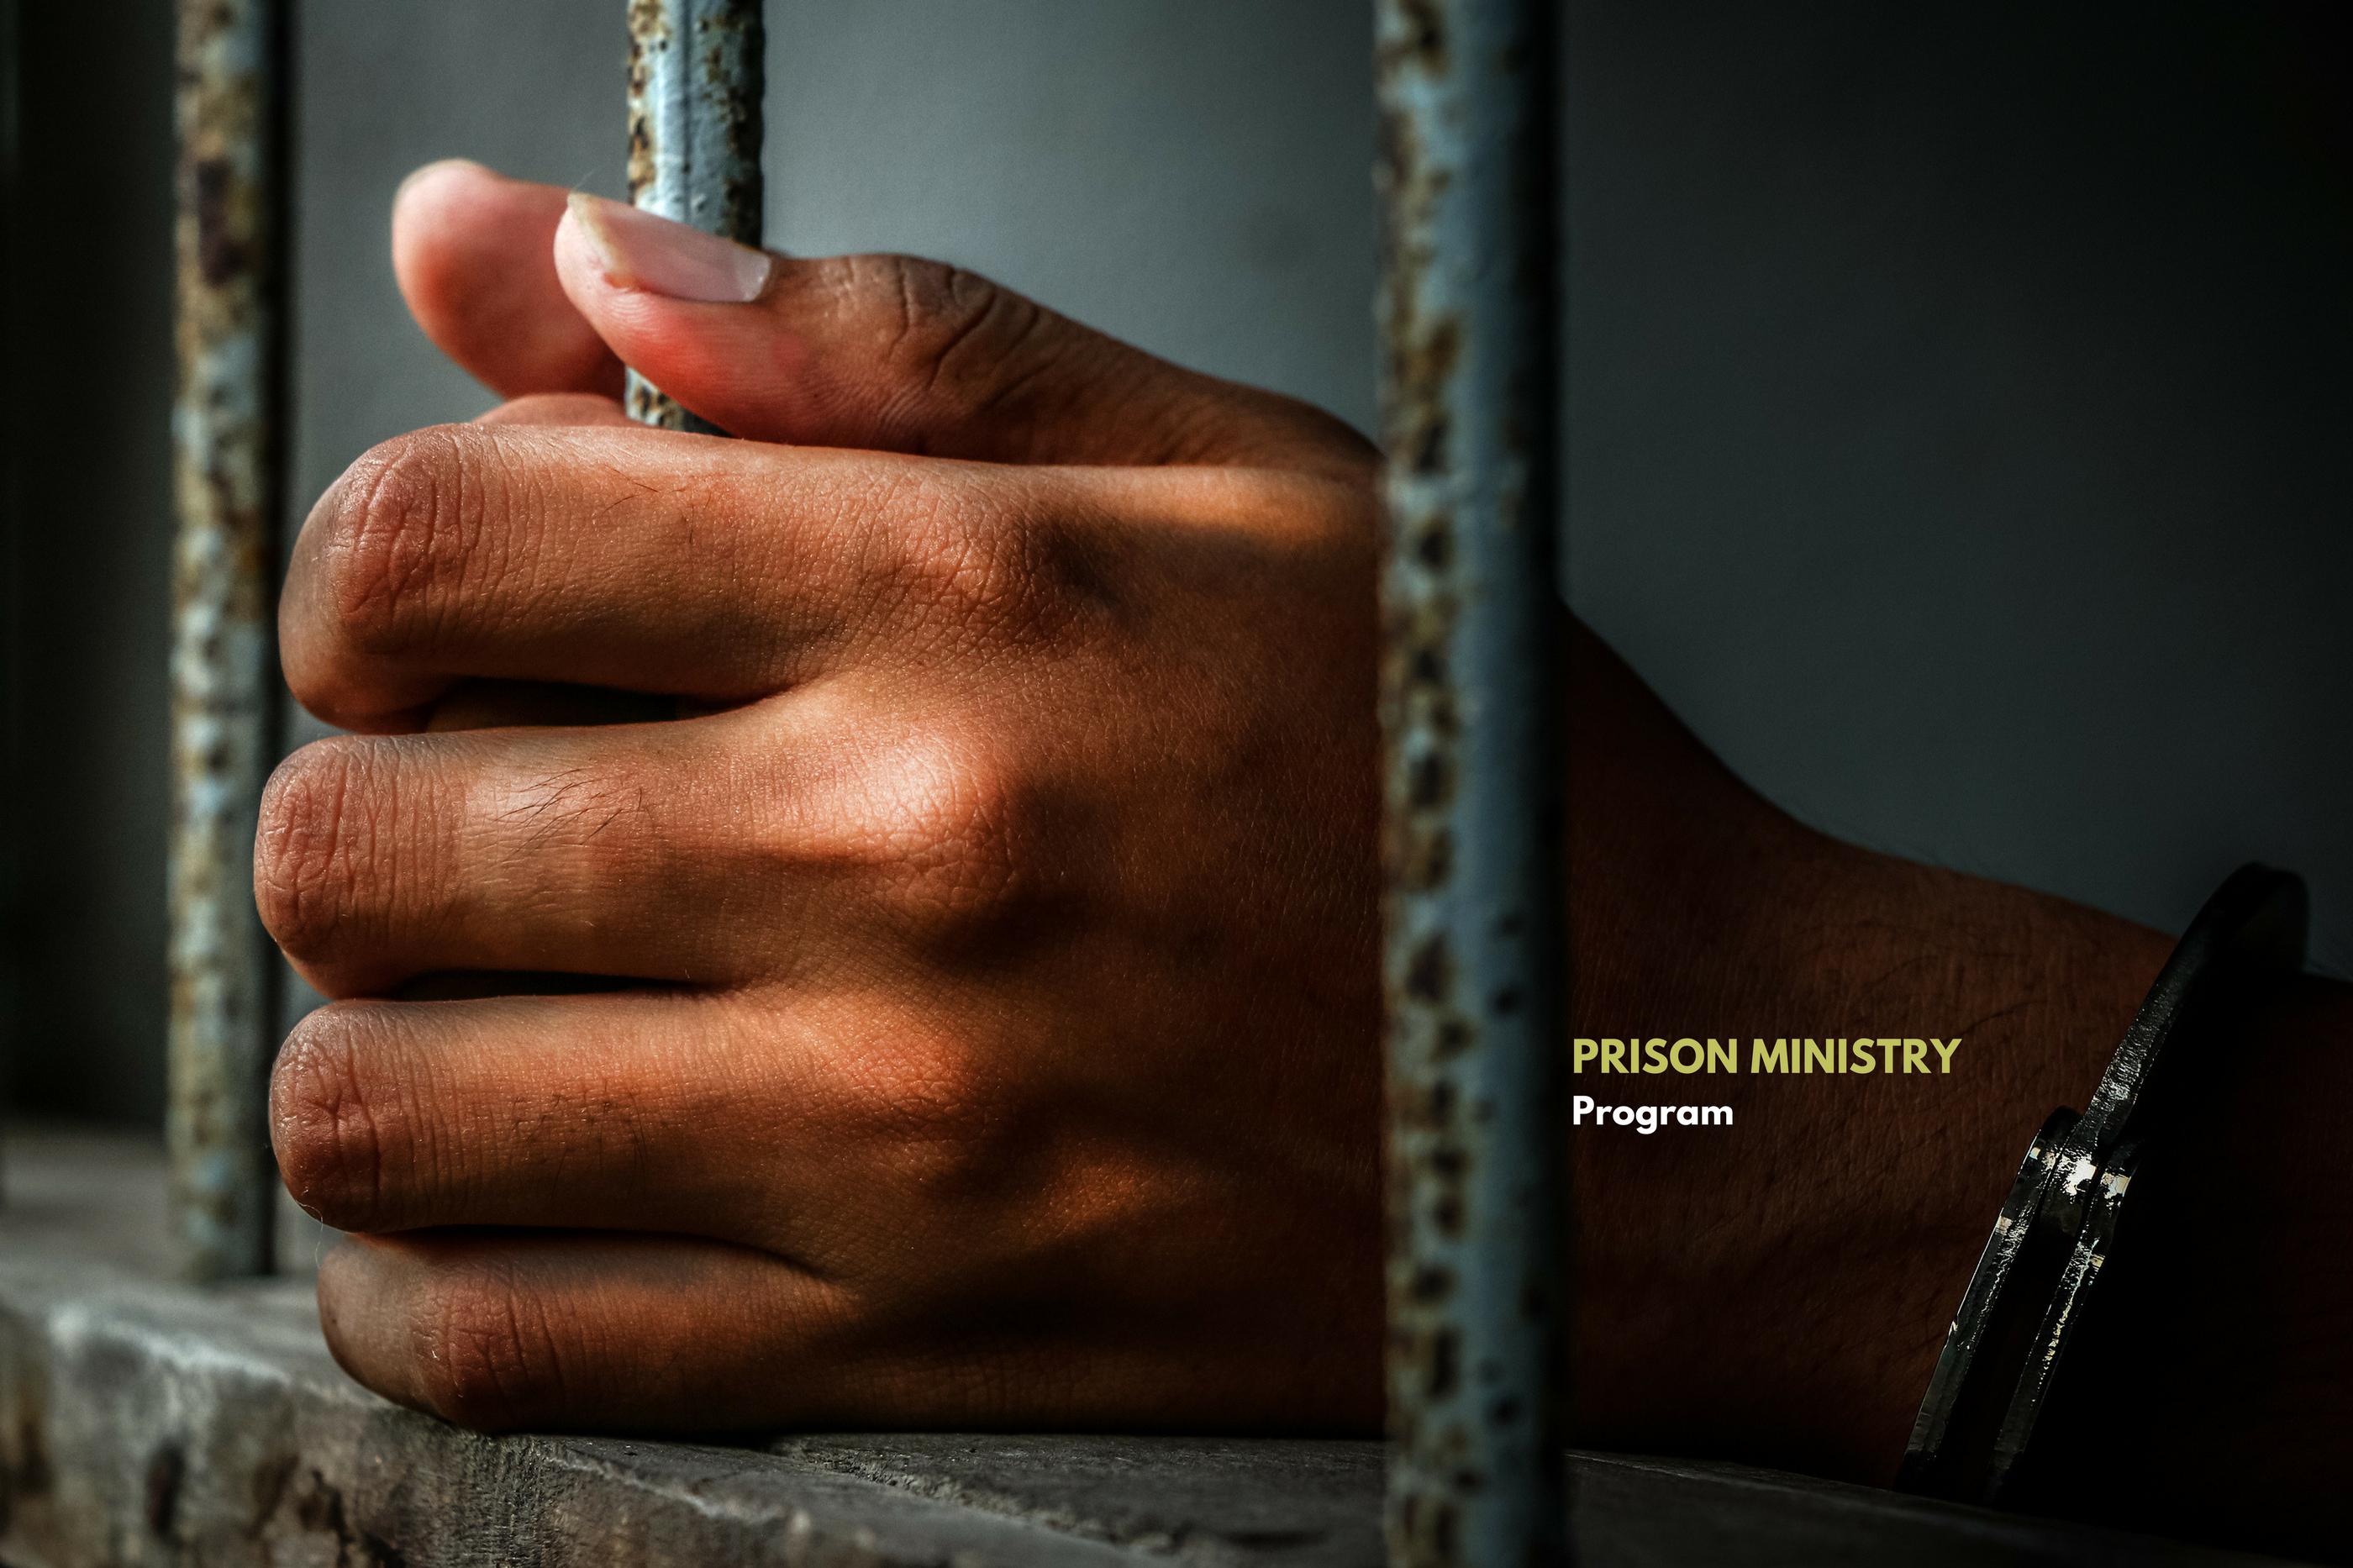 Prison Ministry Program